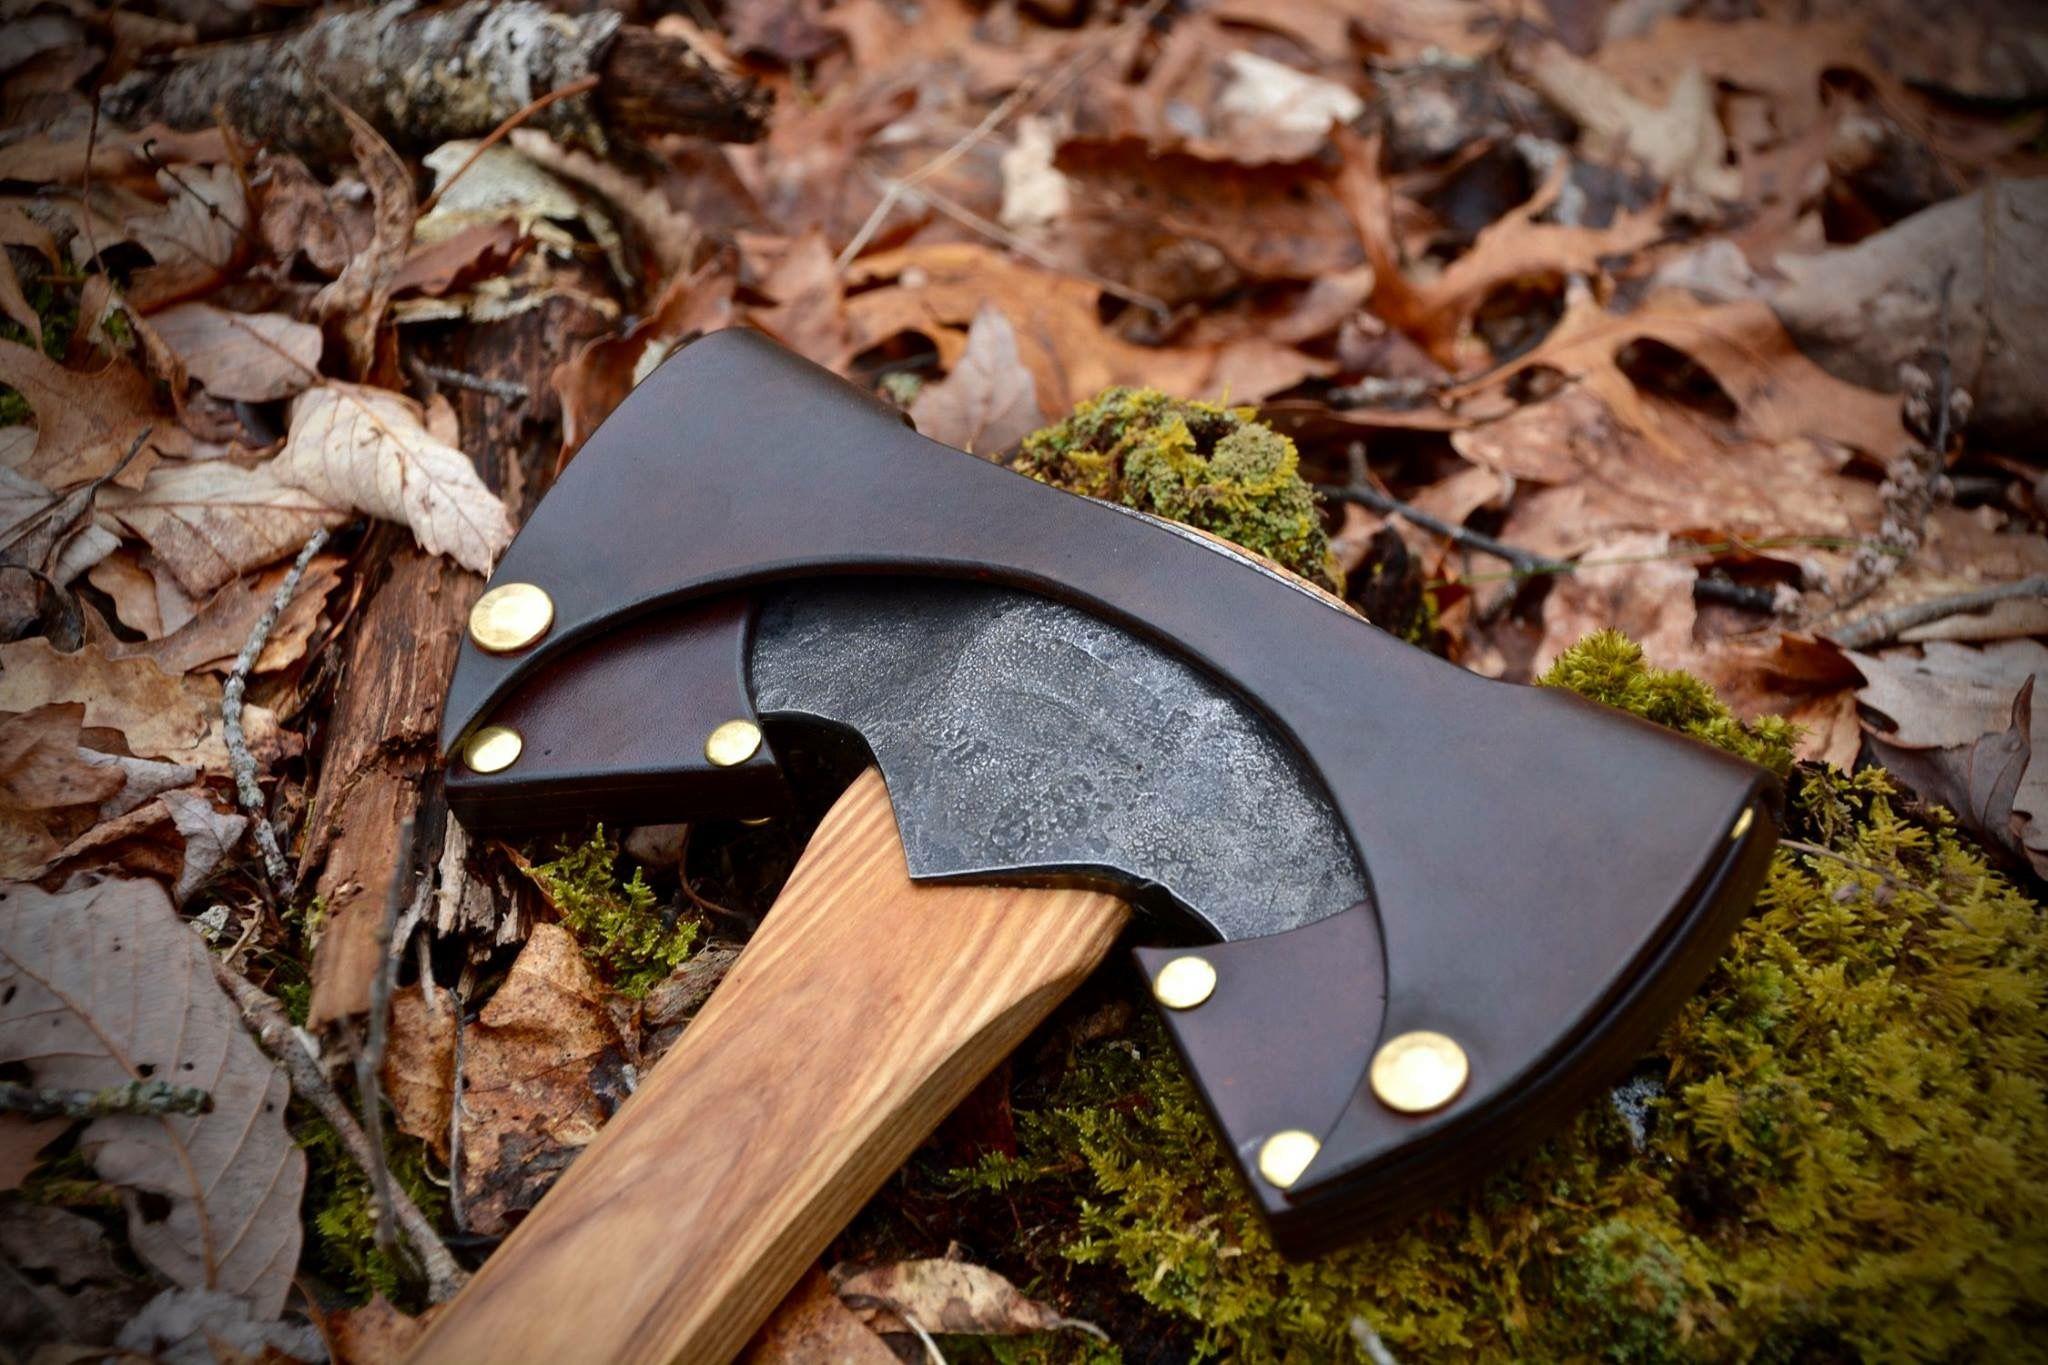 IMG_6068.JPG Blacksmithing, Axe sheath, Axe handle